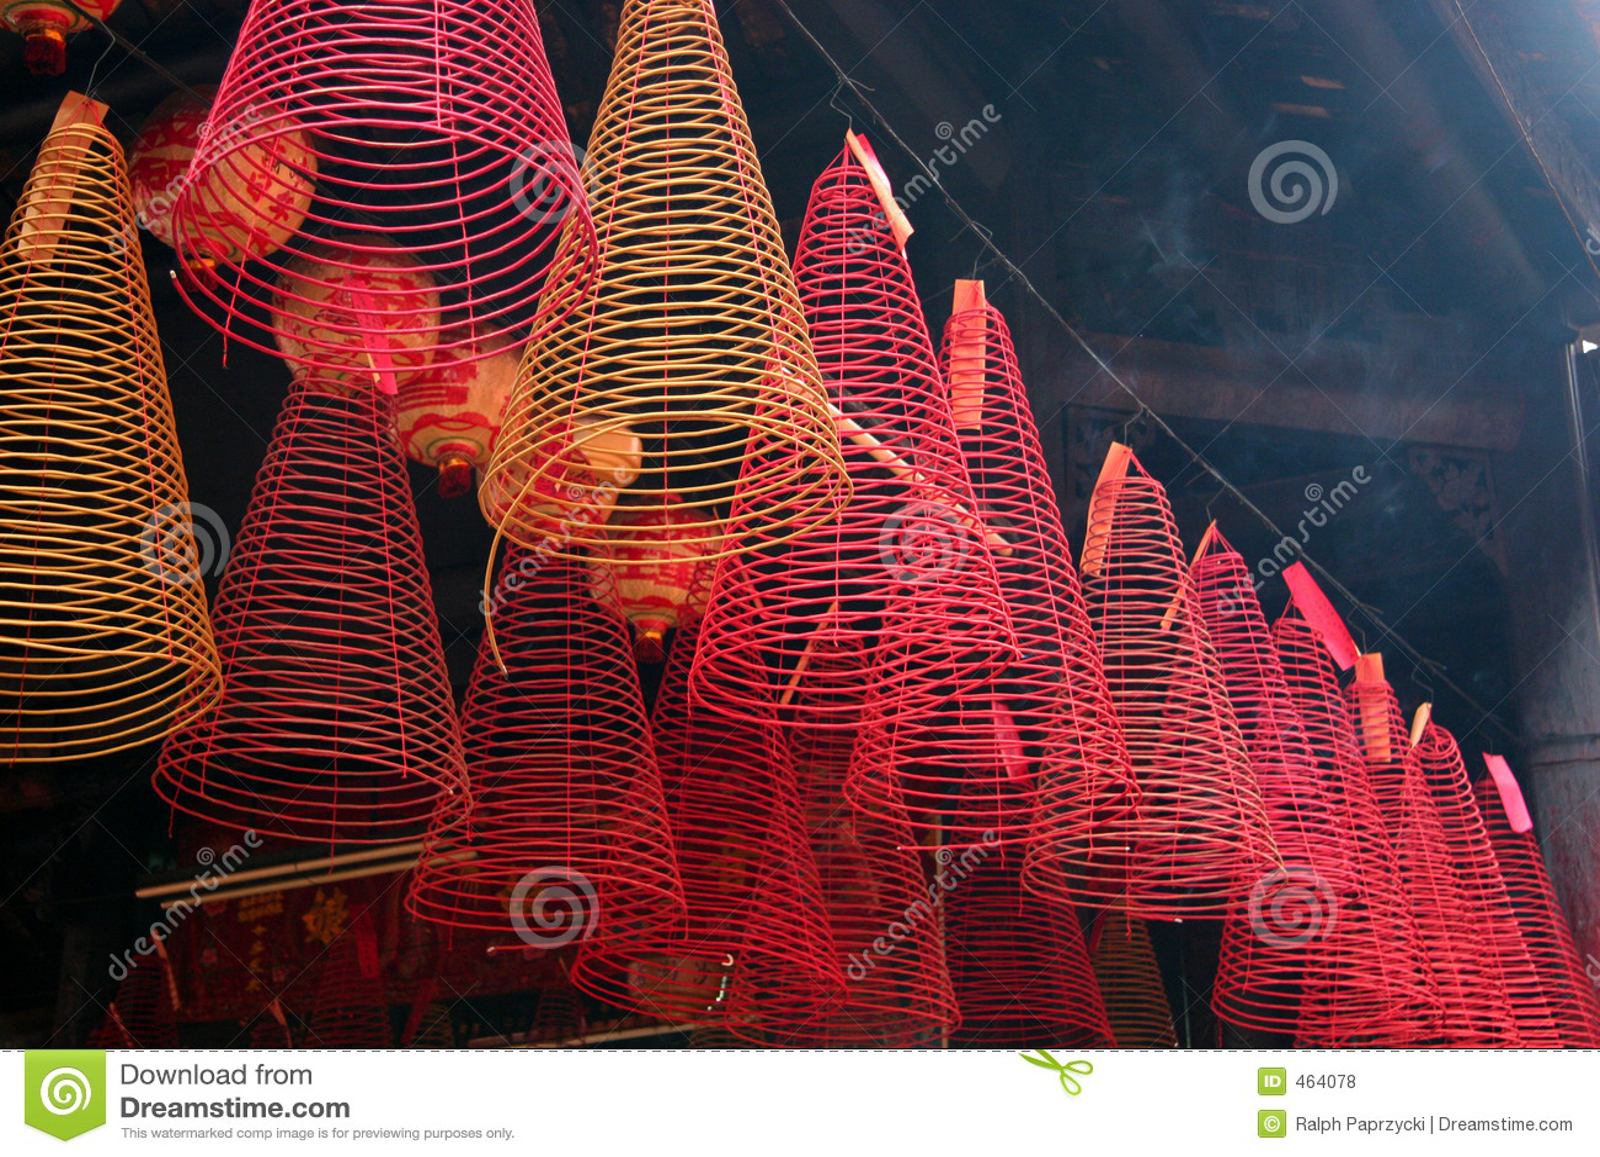 Download Incense, Tam Son Hoi Quan Pagoda, Ho Chi Minh City Stock Photo - Image of prayer, culture: 464078